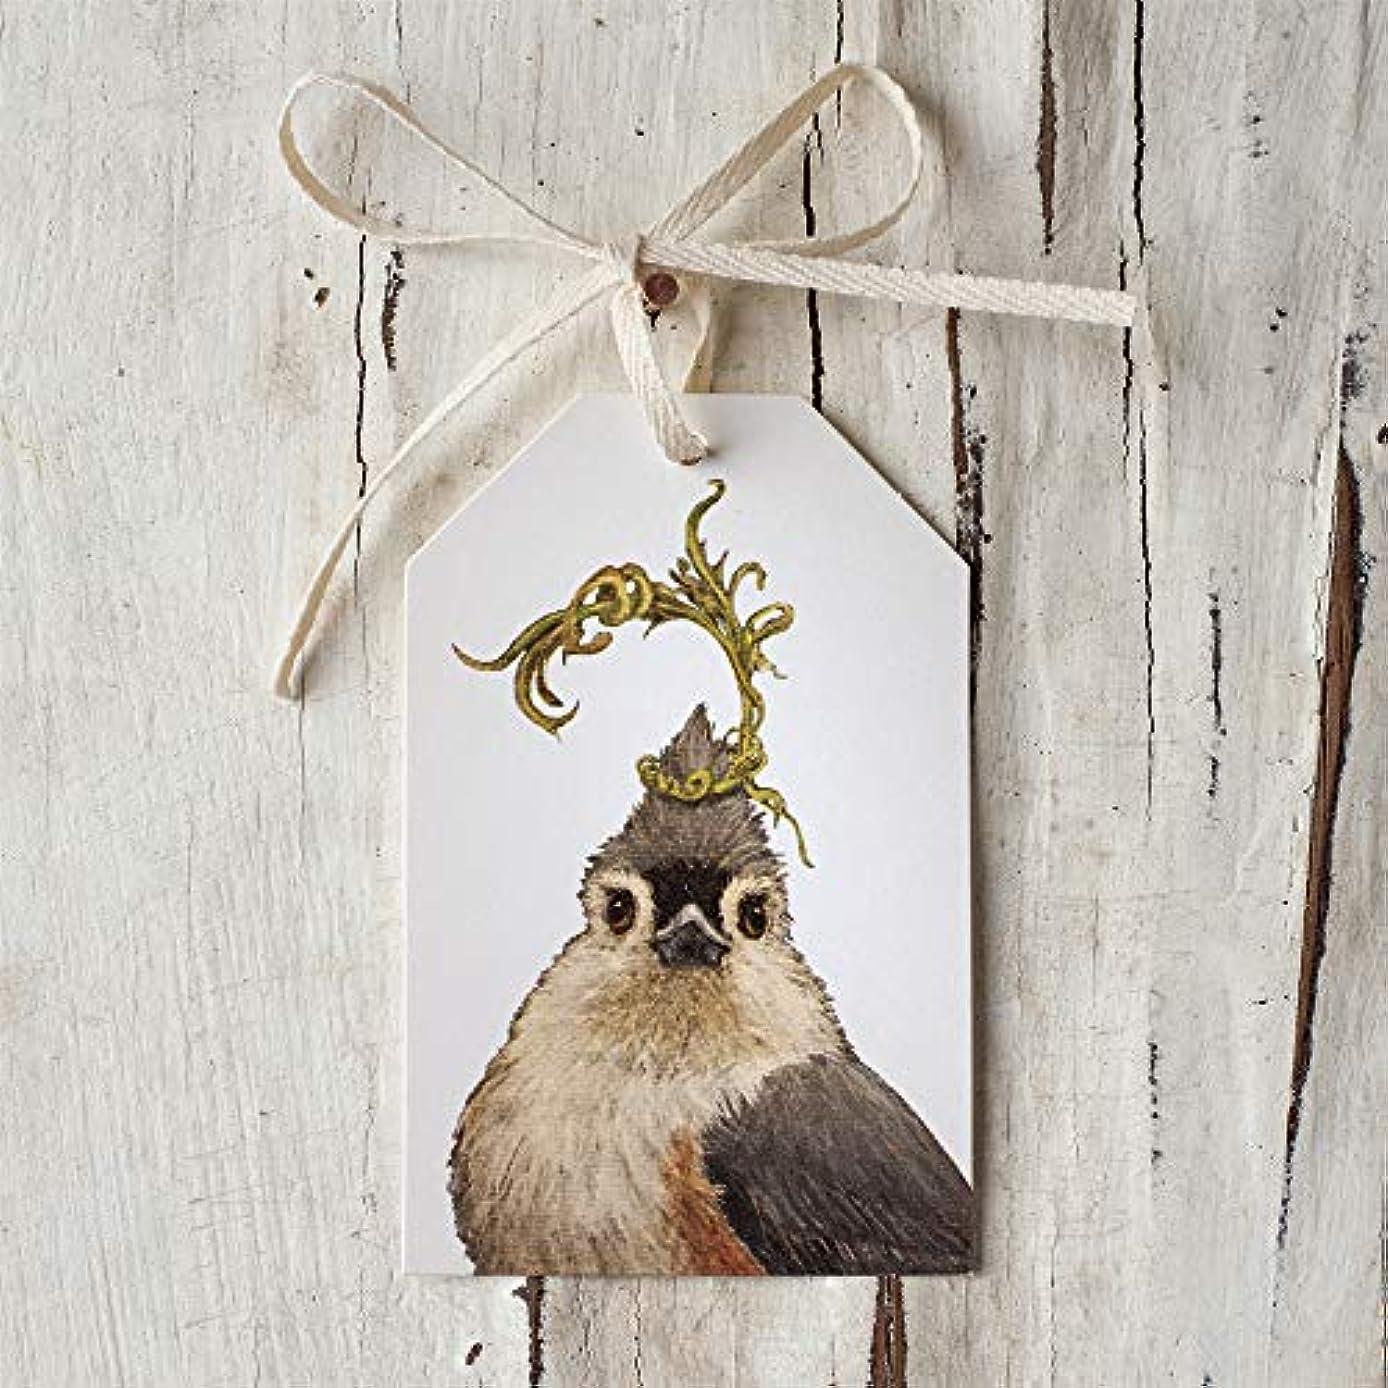 Hester & Cook Gift Tag/Napkin Holder/Bottle Tag - Songbird